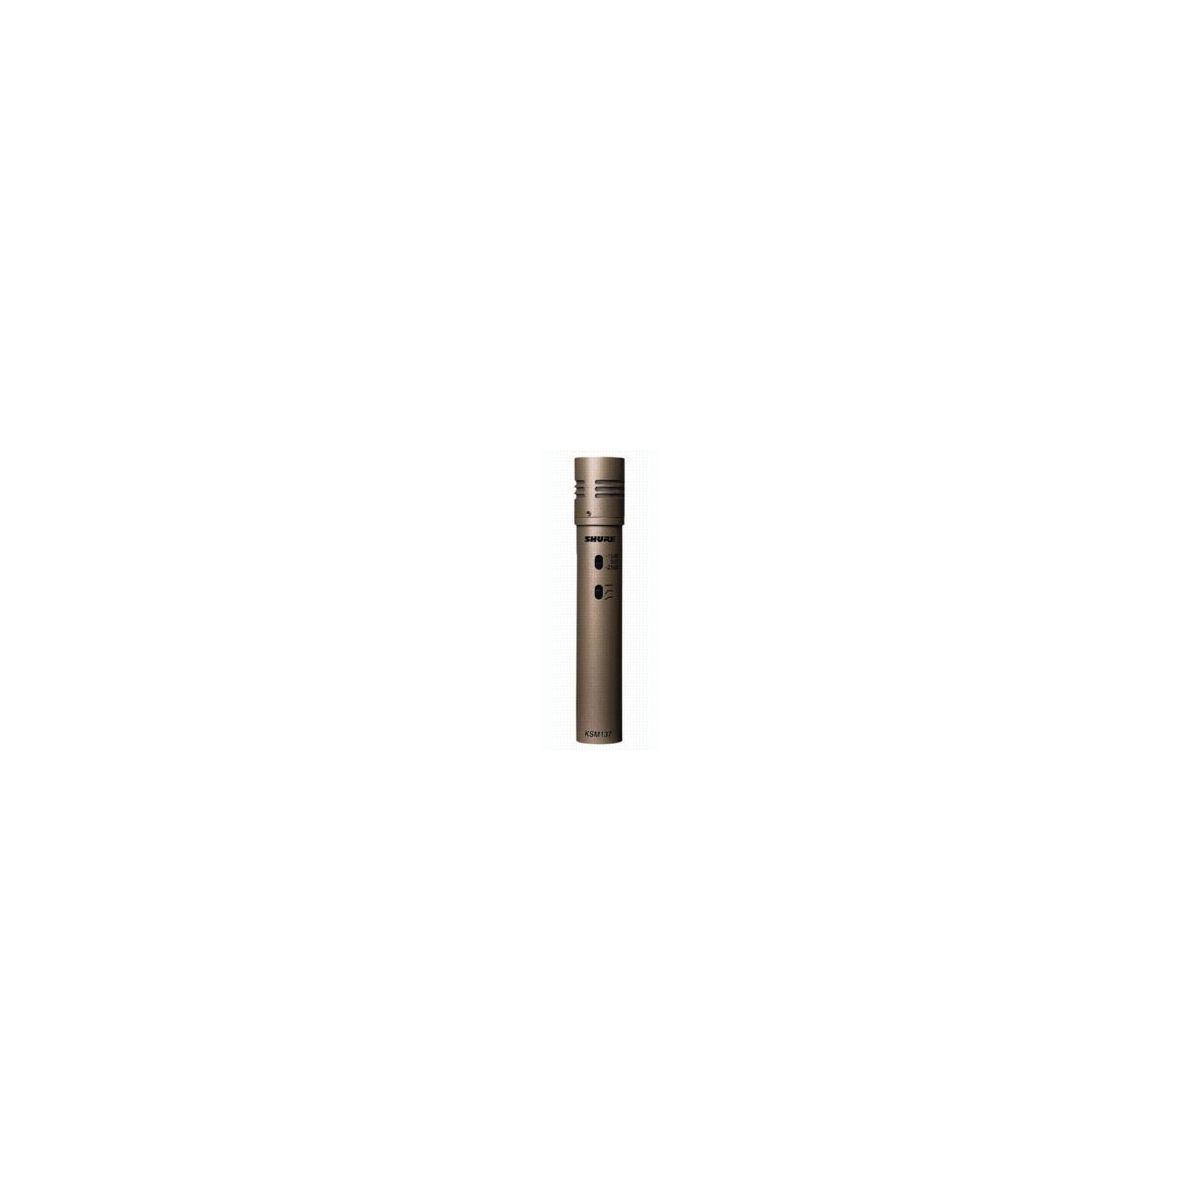 Micros instruments - Shure - KSM137 SL